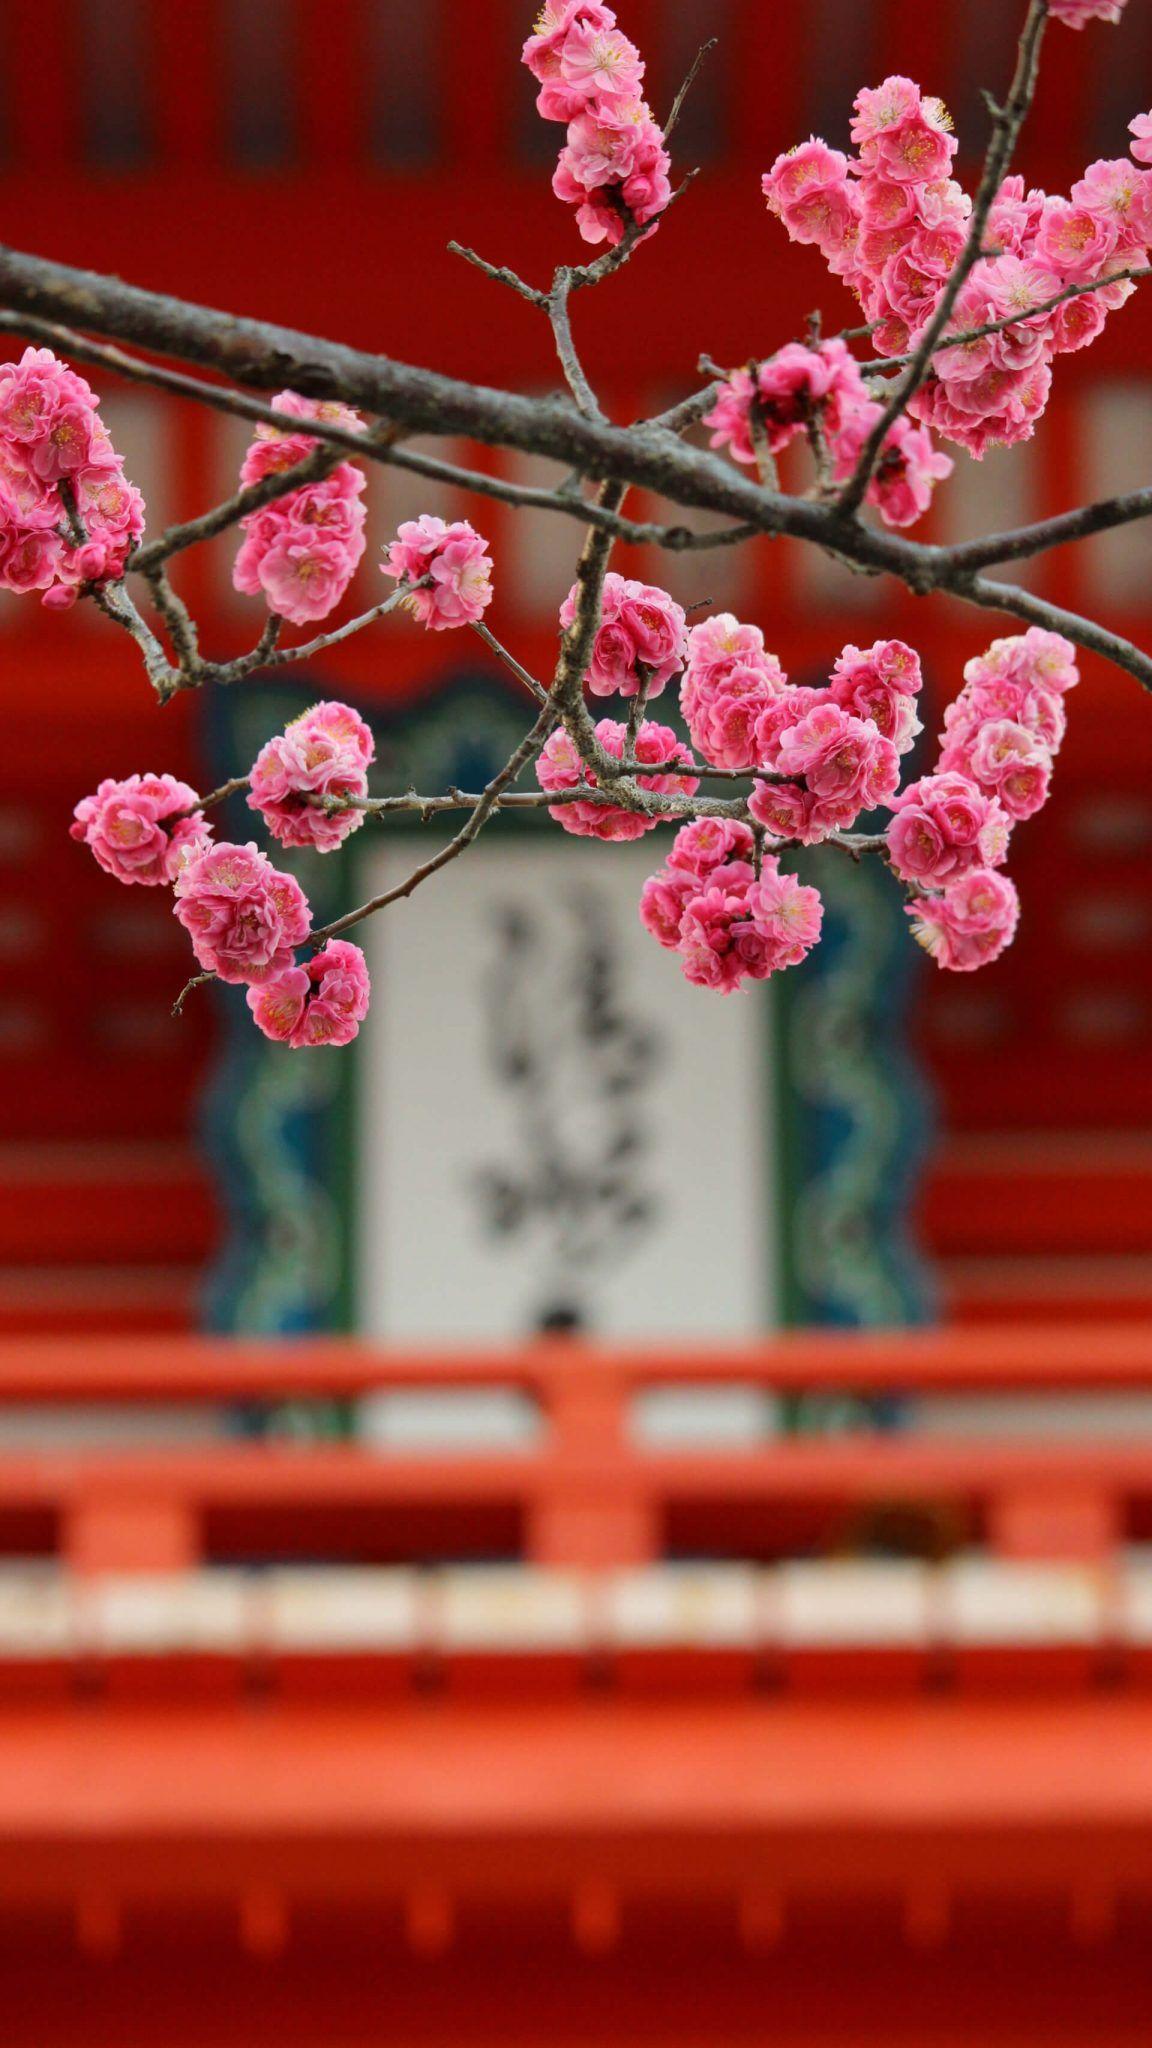 999 4k Hd Iphone Lockscreen Background Wallpaper Cloud Clipart Cherry Blossom Japan Beautiful Flowers Images Flower Images